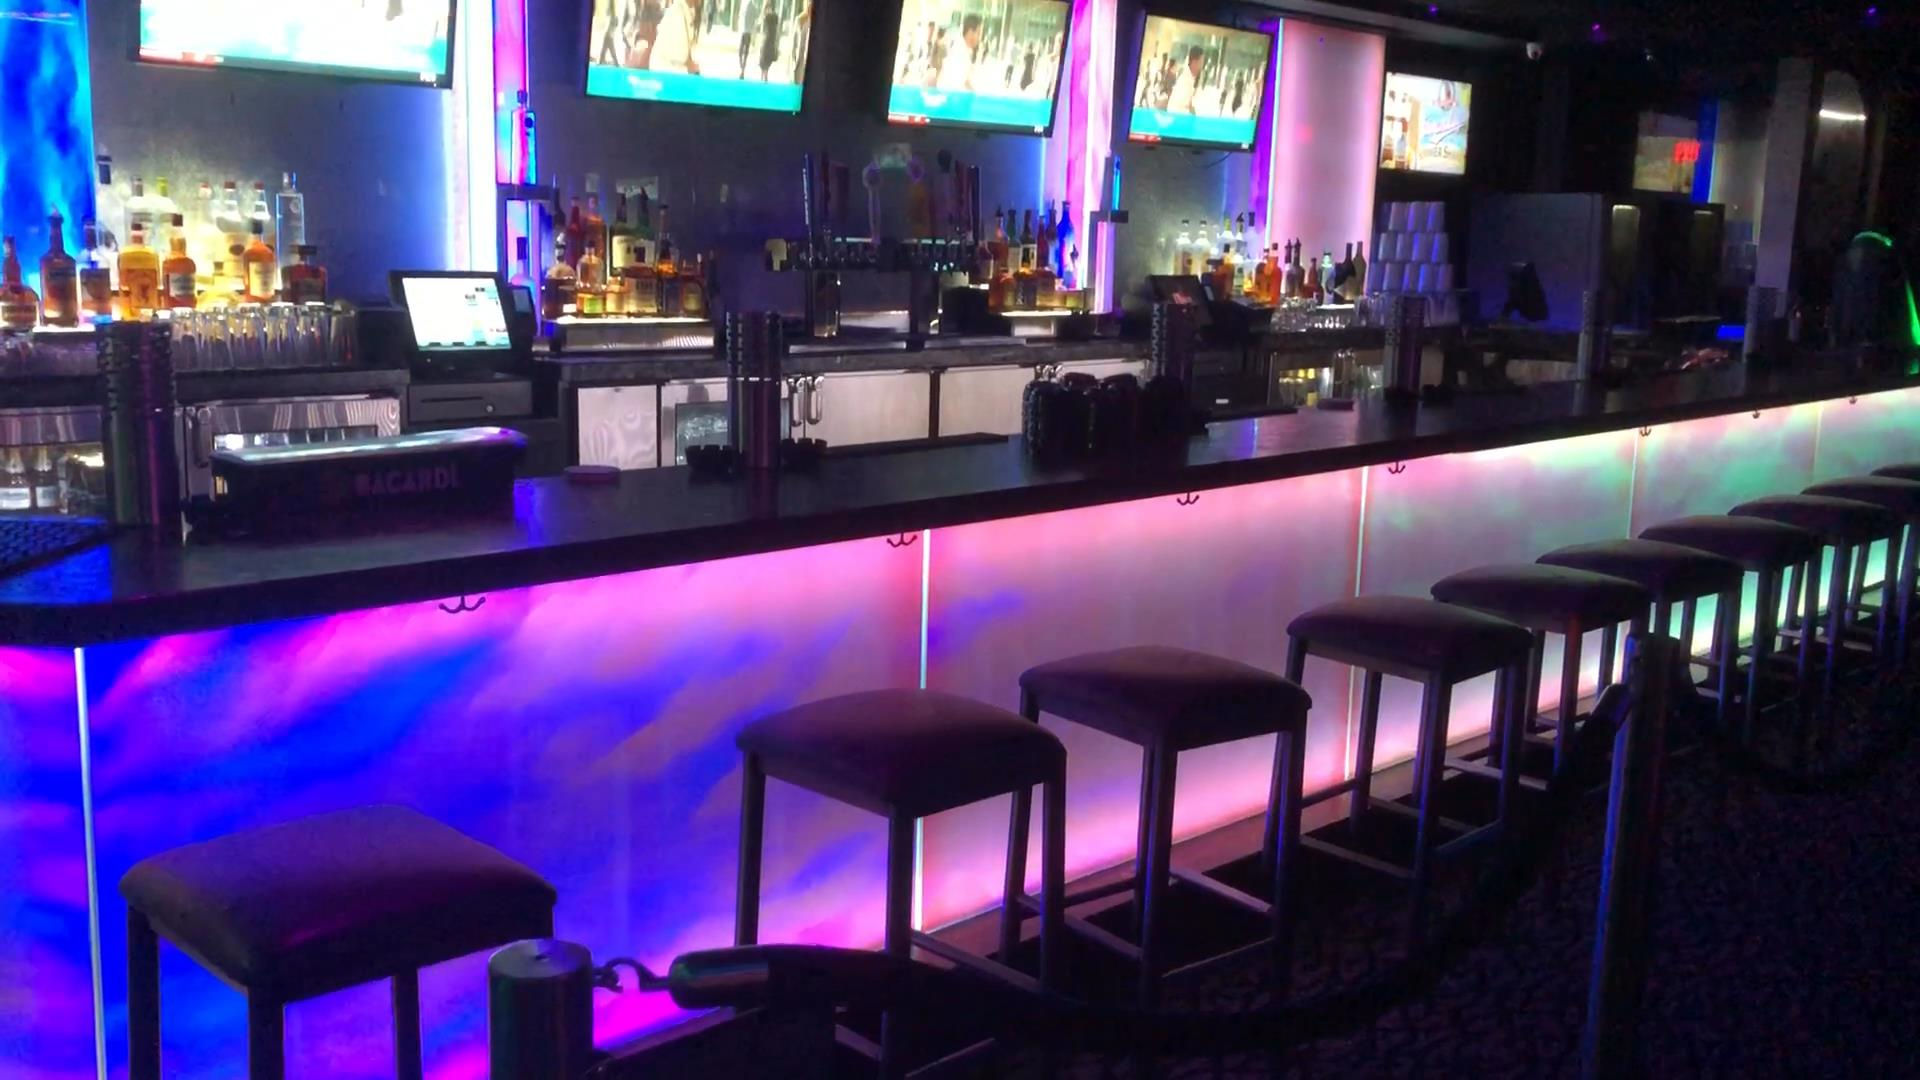 LED bar design for Night Trips Gentlemen's Club in Tulsa, OK